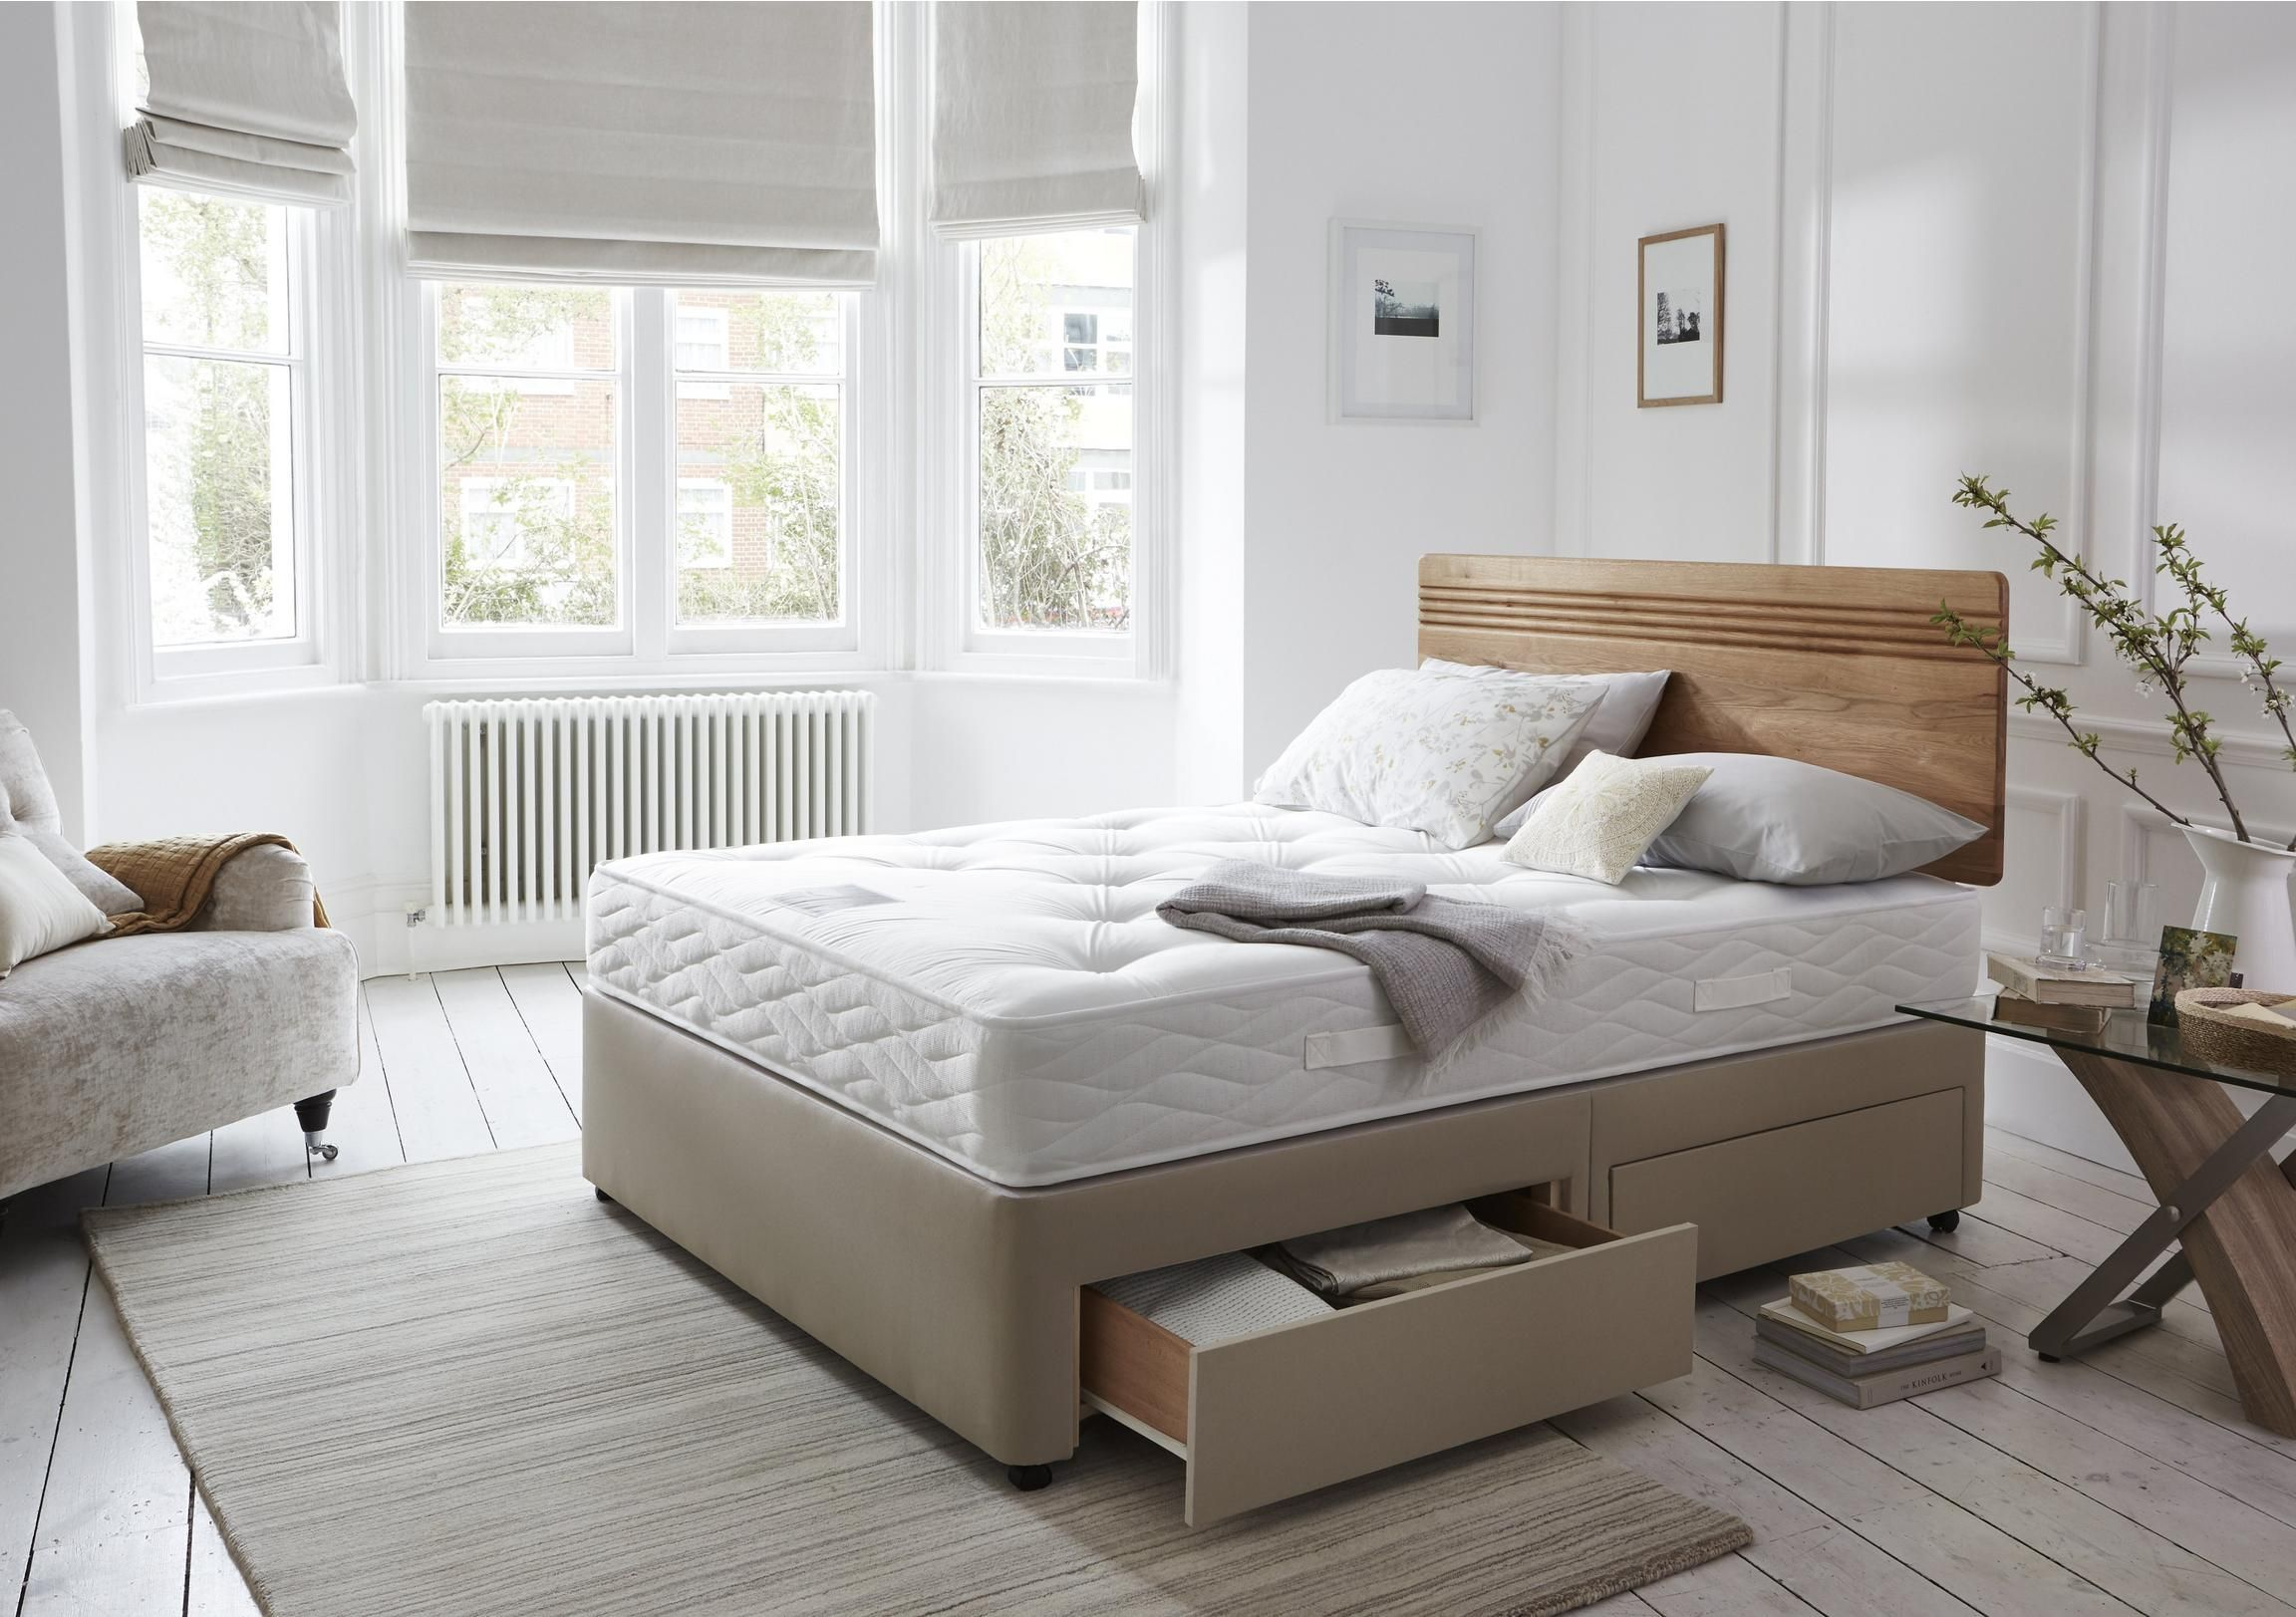 My Super Support Divan Set Divan Sets Beds For Small Rooms Bed